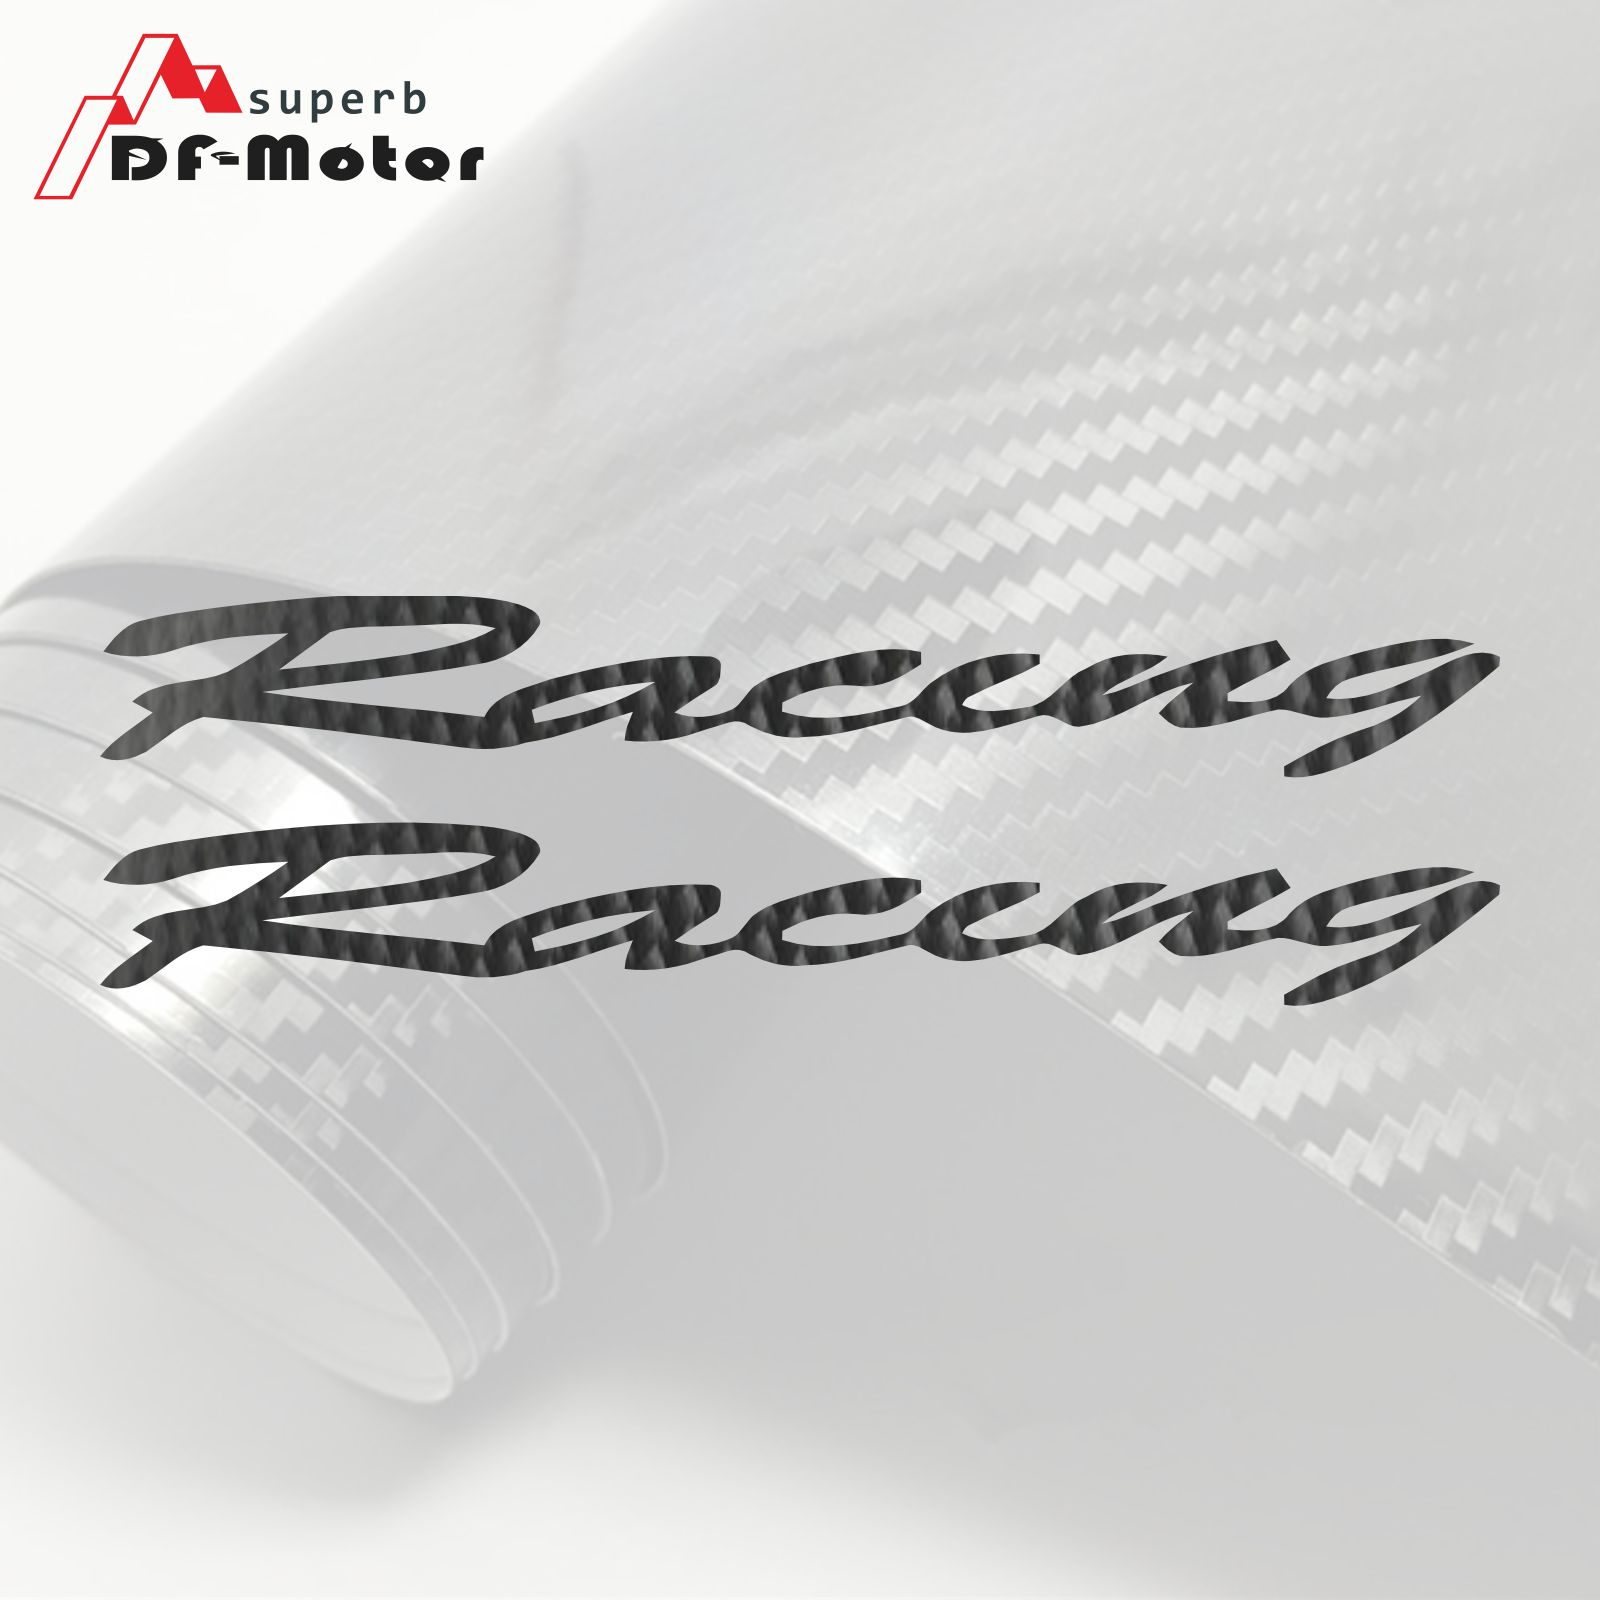 8Inch 5D Carbon Fiber Sticker Decal Motorcycle Car Sticker Wheels Fairing Helmet Sticker DIY Fit For Honda Racing